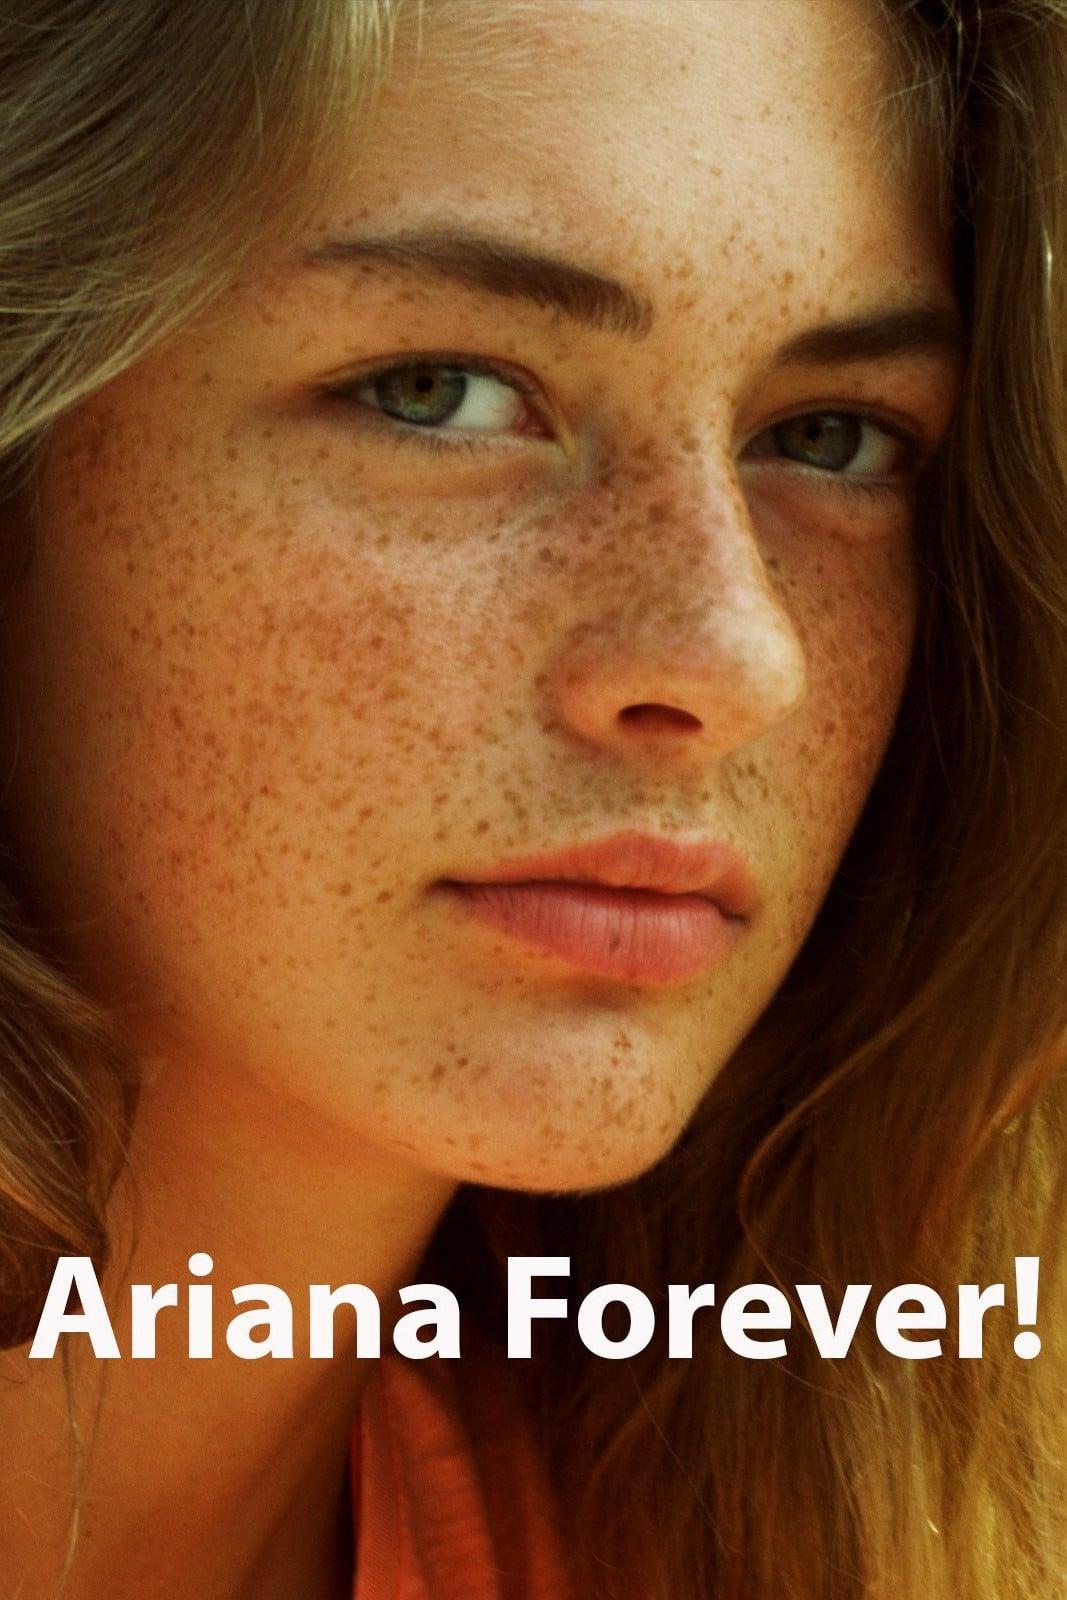 Ariana forever!